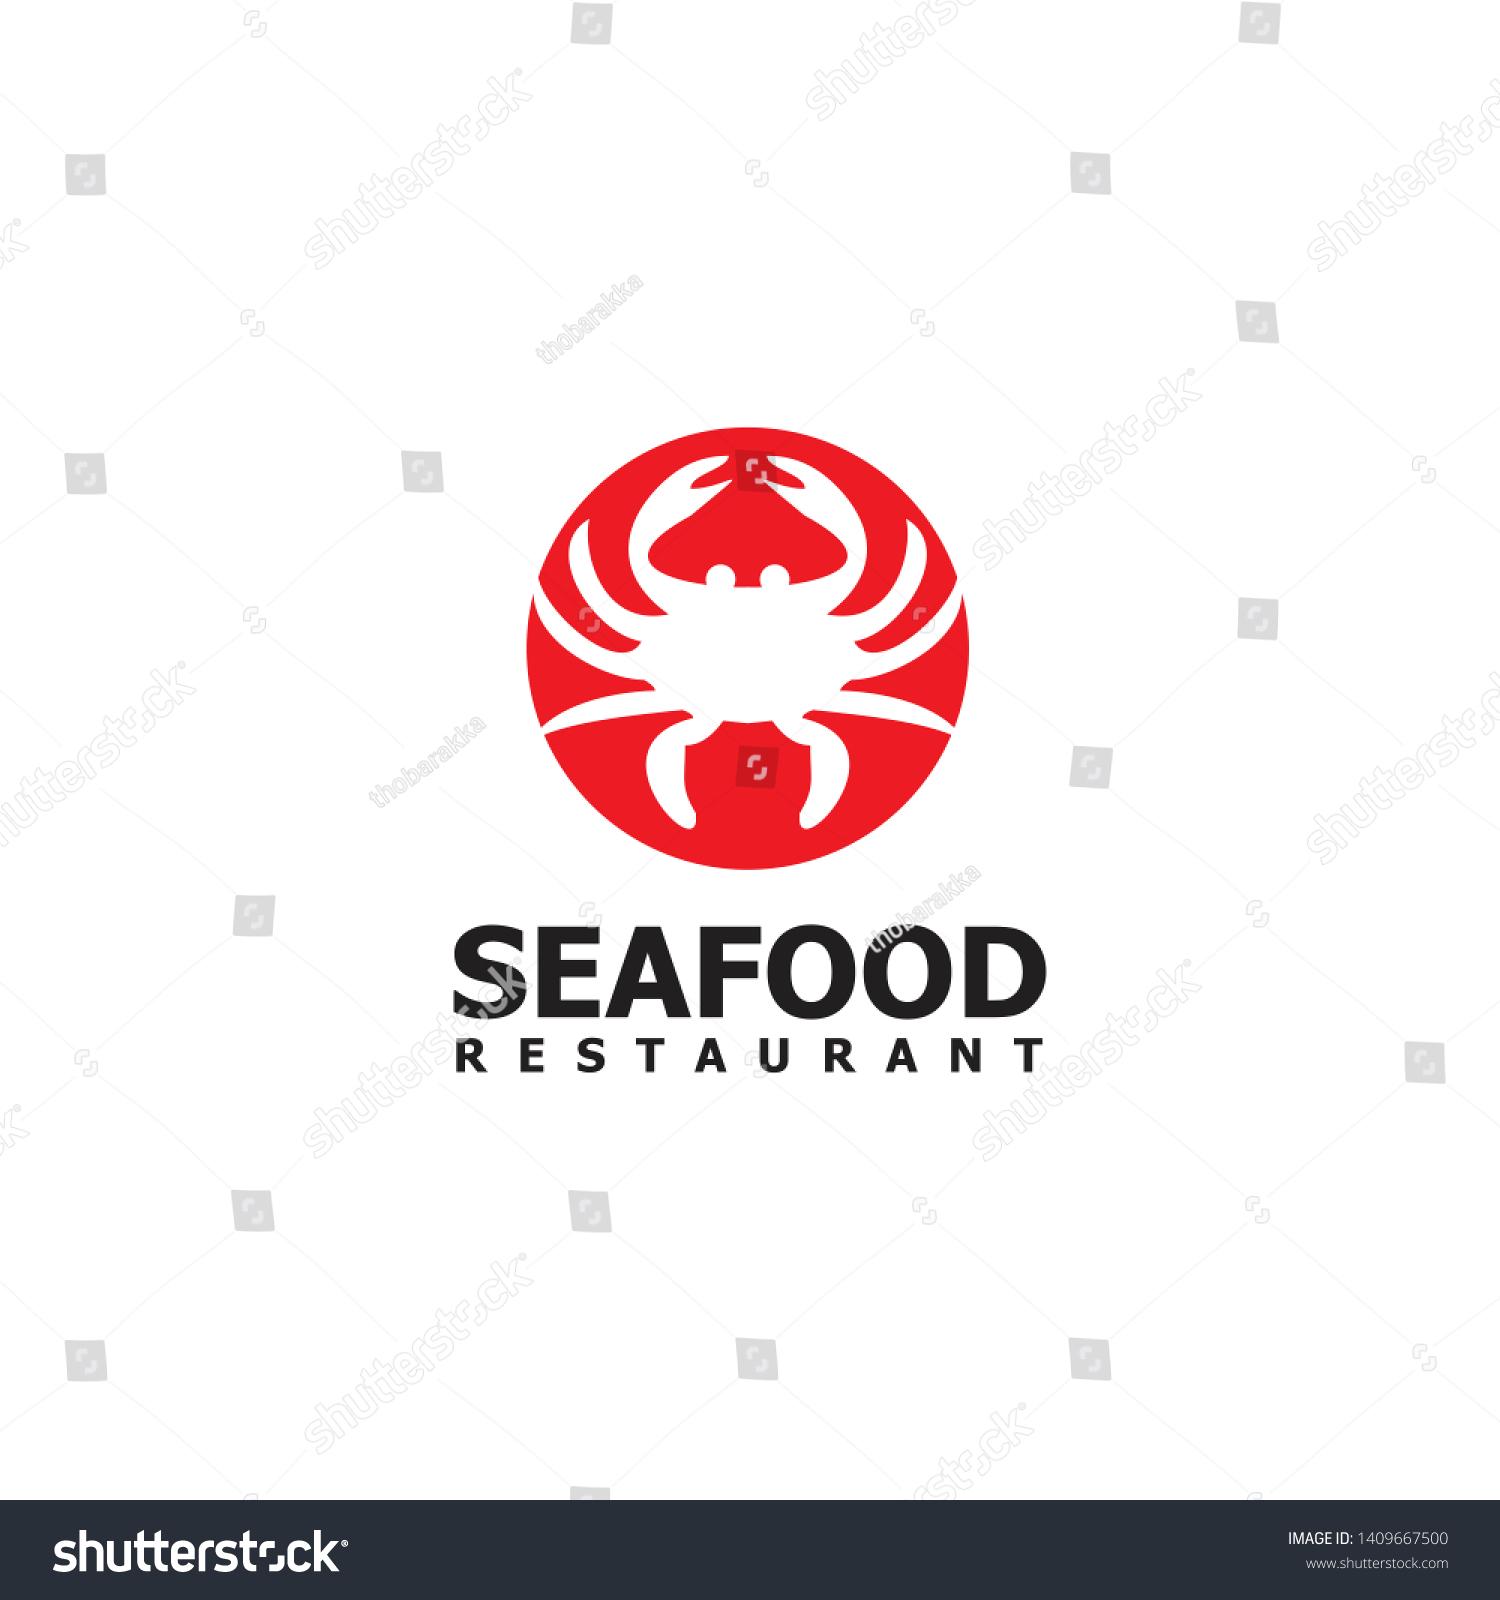 Vector De Stock Libre De Regalias Sobre Crab Seafood Restaurant Logo Design Vector1409667500